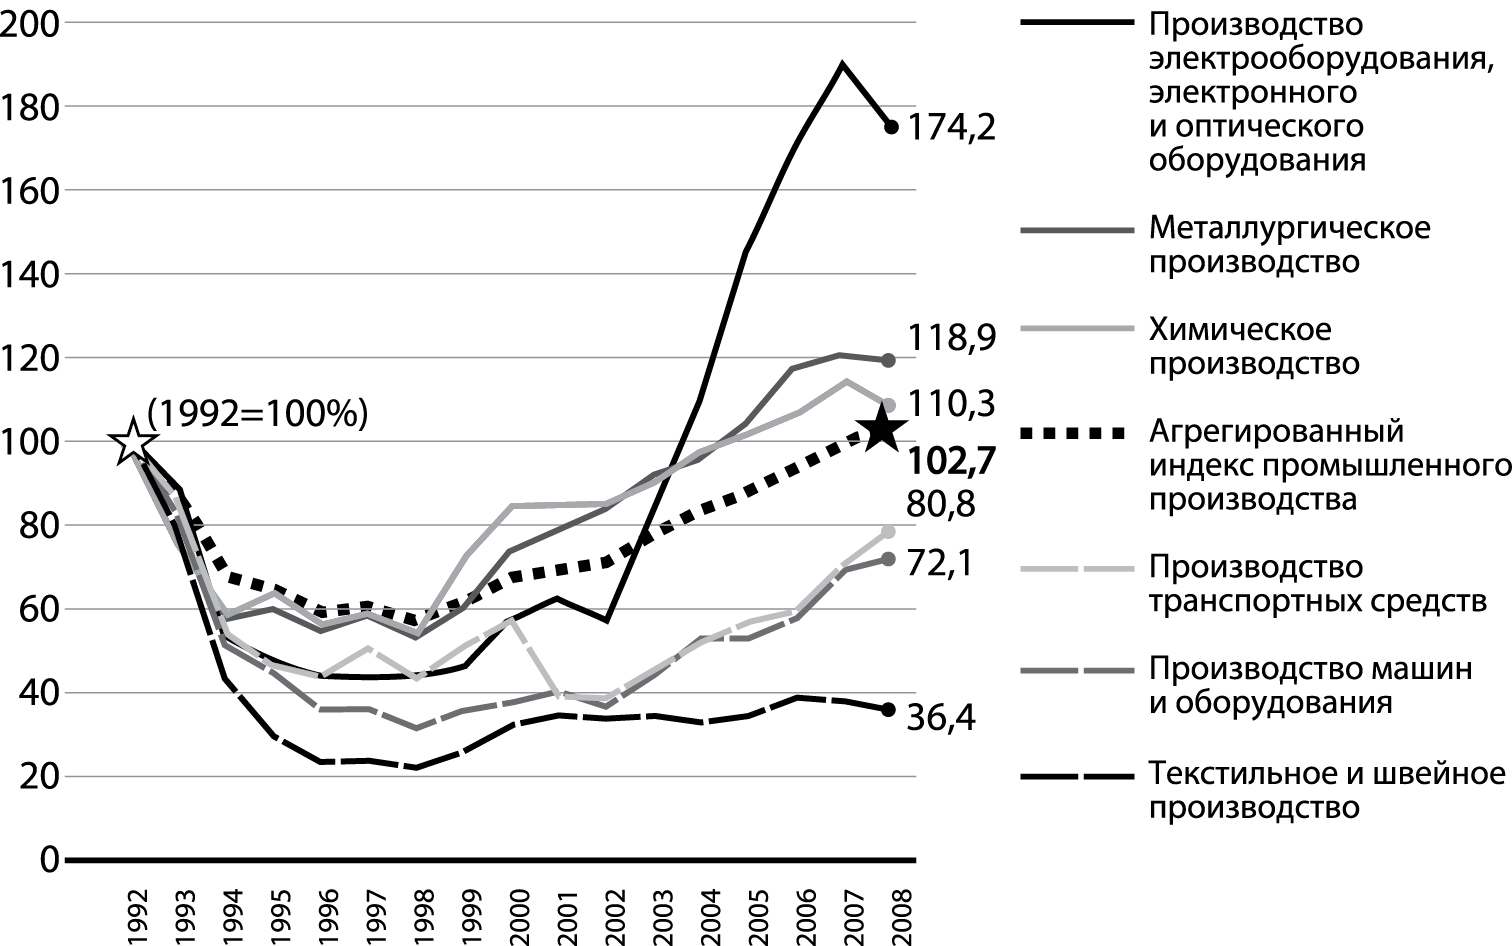 Либерализа́ция цен  в начале 1990-х годов | а.д.семёнова, временно заблокированного с 10.08.2020 по 08.10.2295 (на 275 лет)